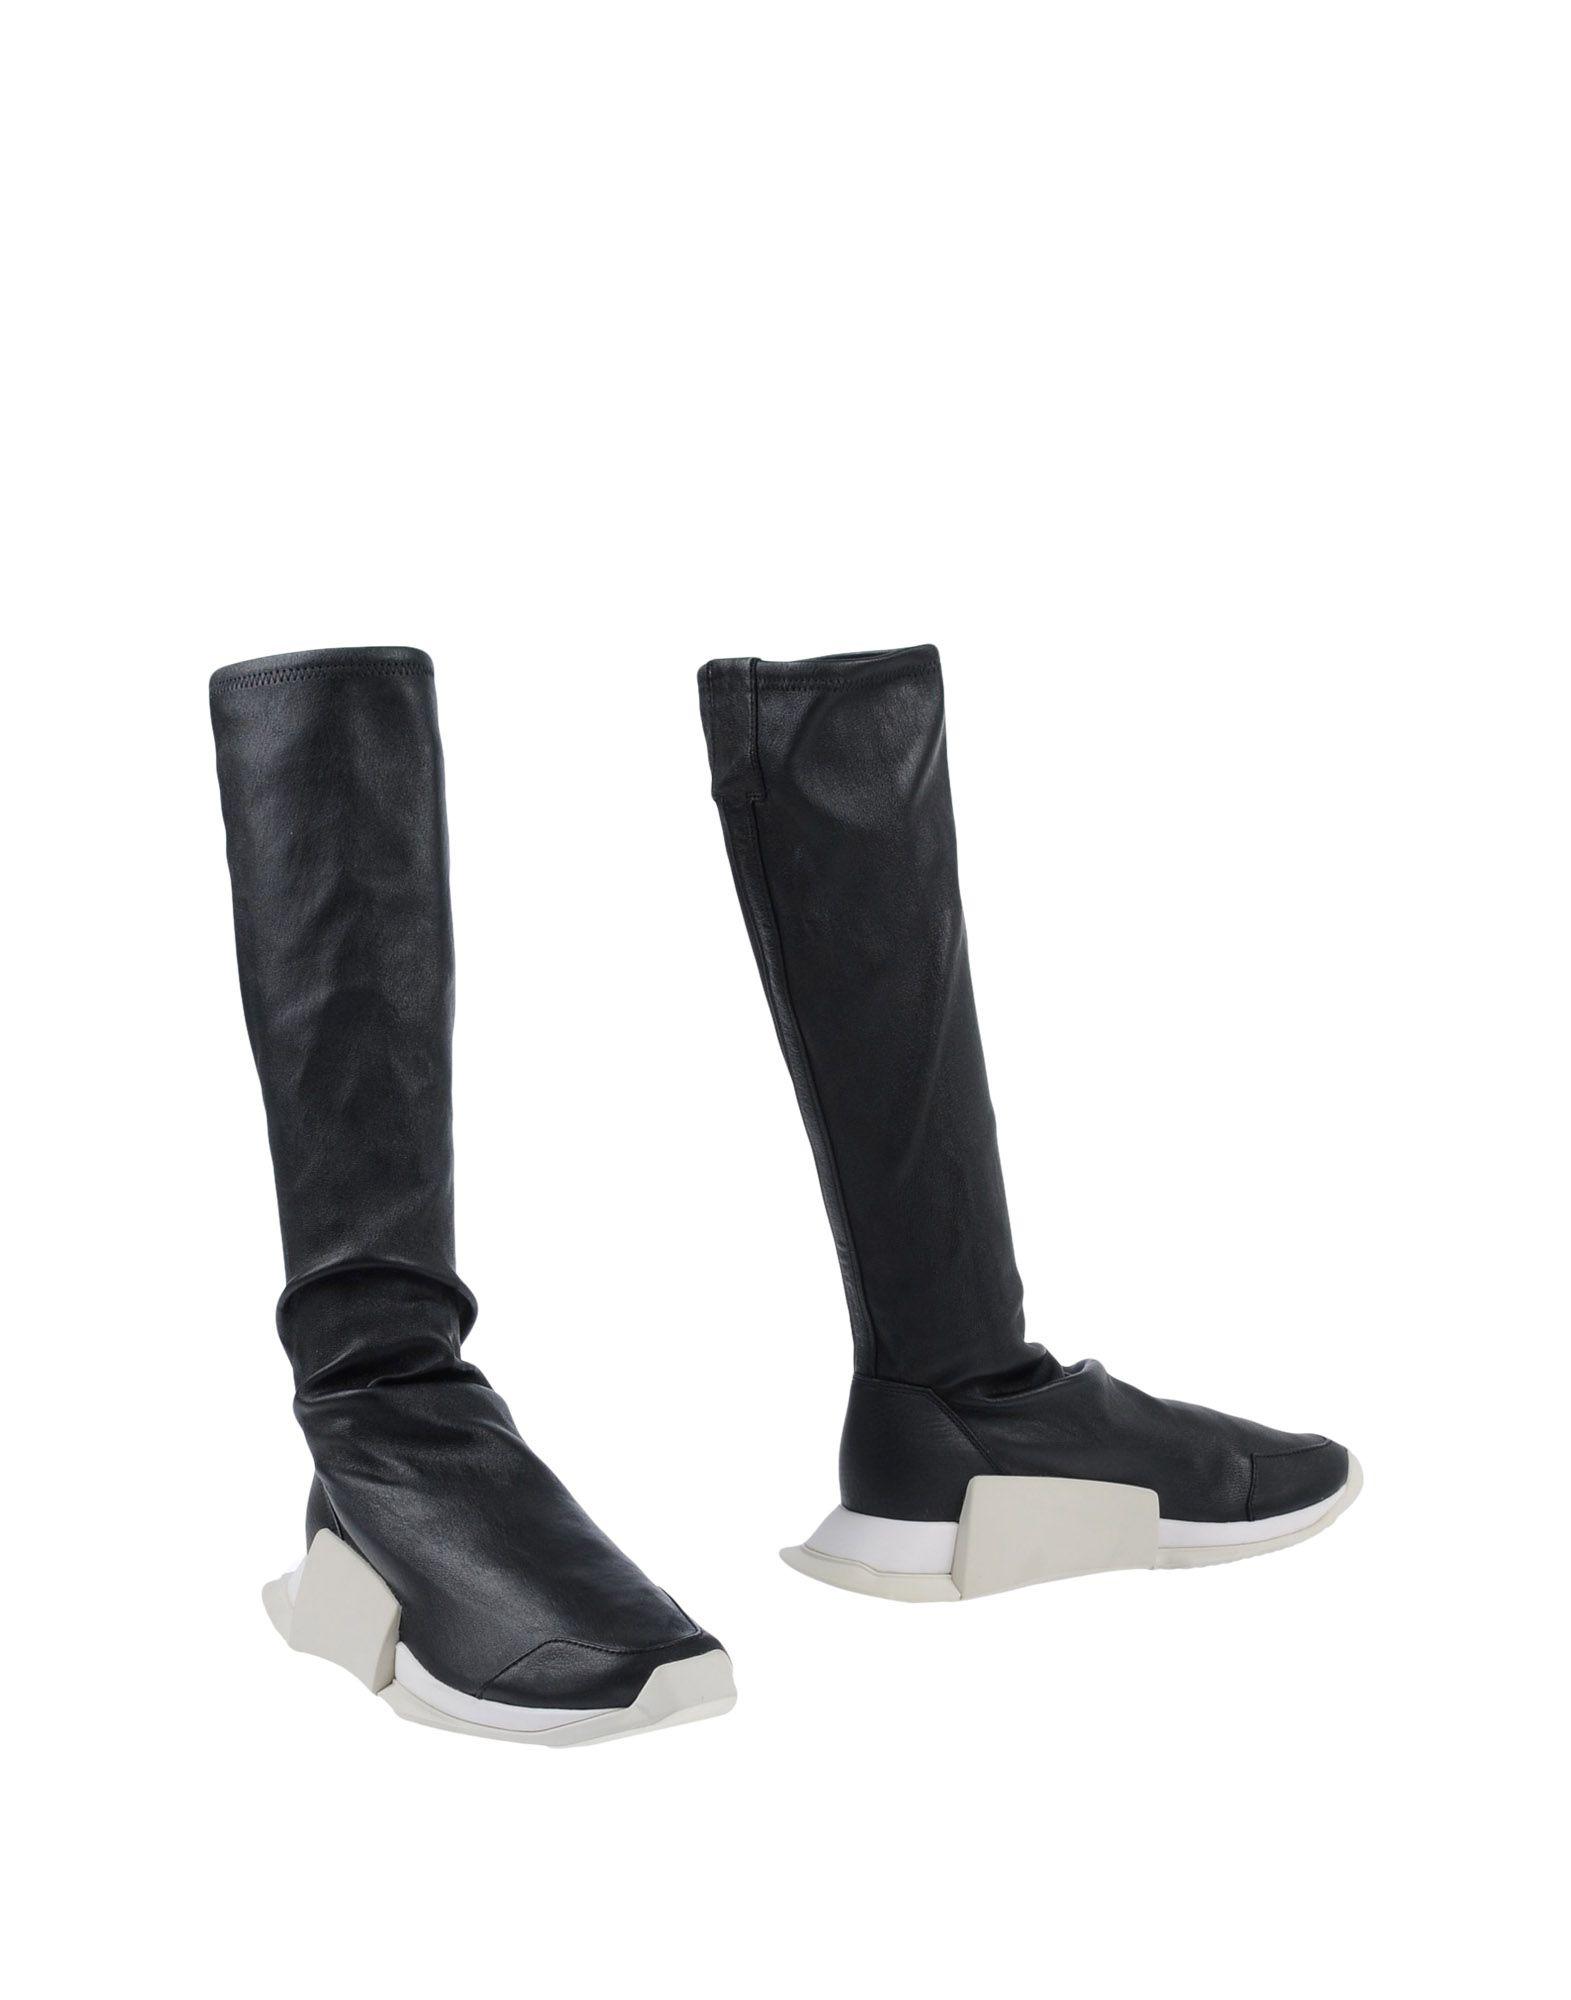 Rick Owens X Adidas Stiefel Stiefel Stiefel Damen  11466416EX Neue Schuhe a4ae07